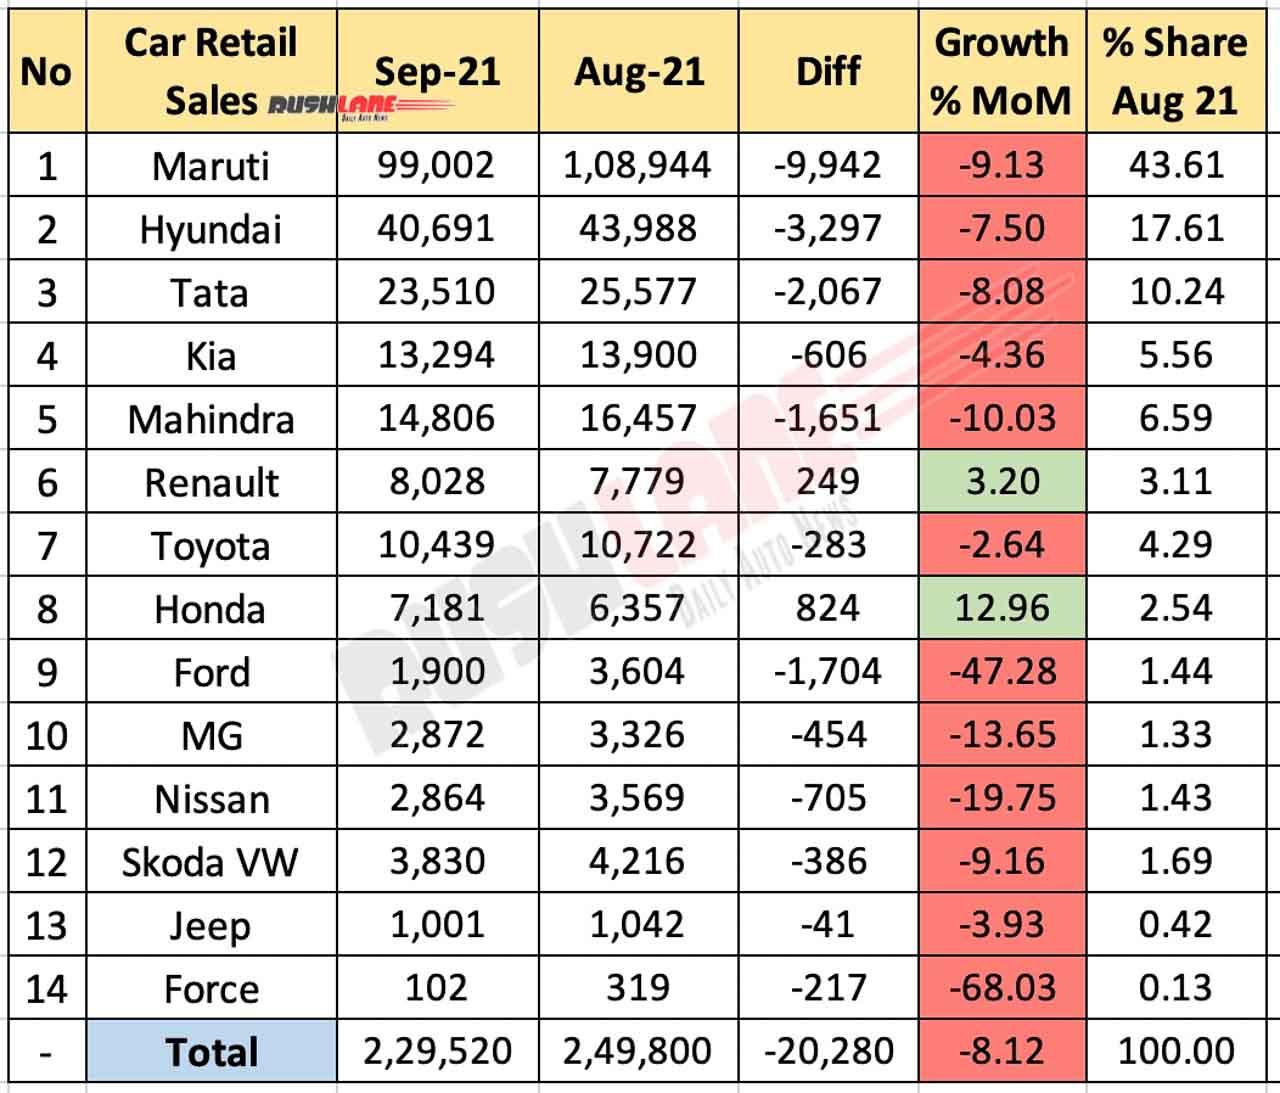 Car Retail Sales September 2021 Vs August 2021 (MoM)